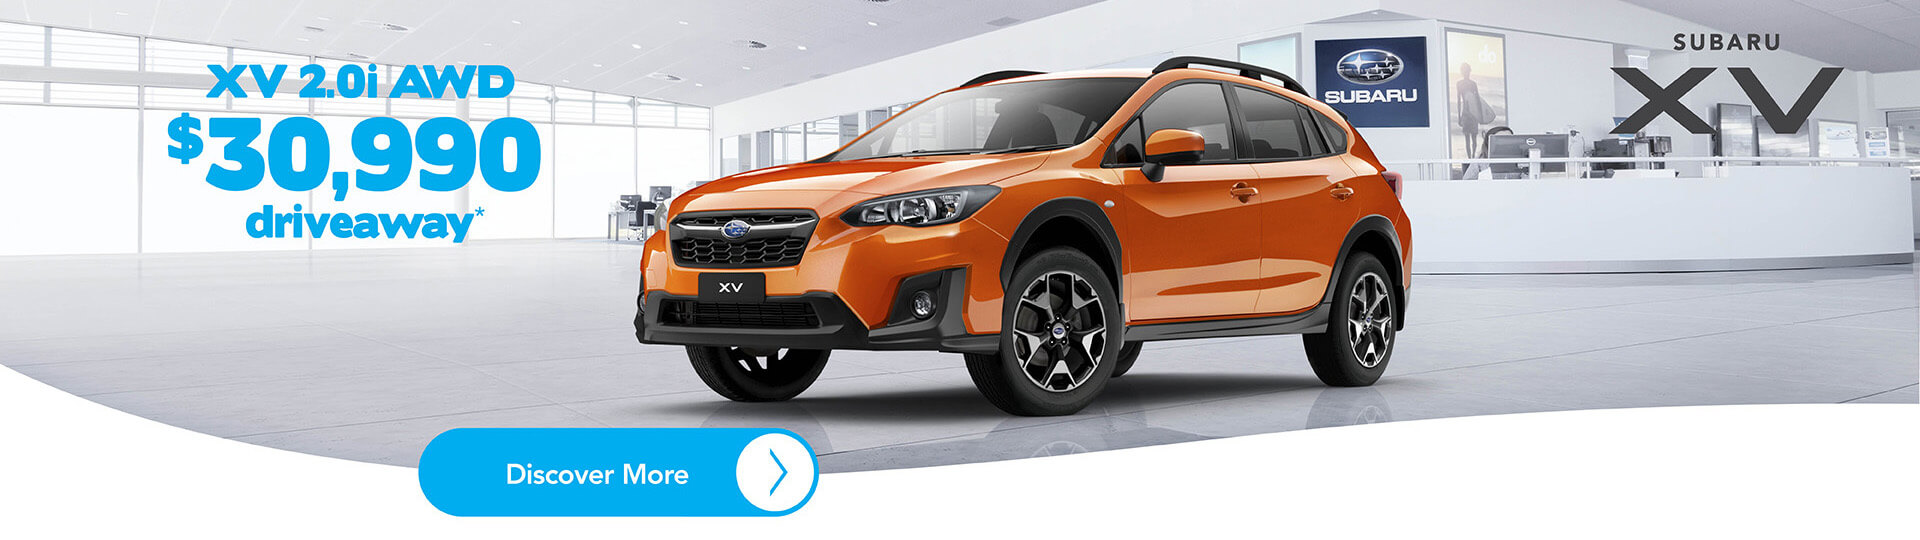 Subaru Offer - Feb 2019 - XV